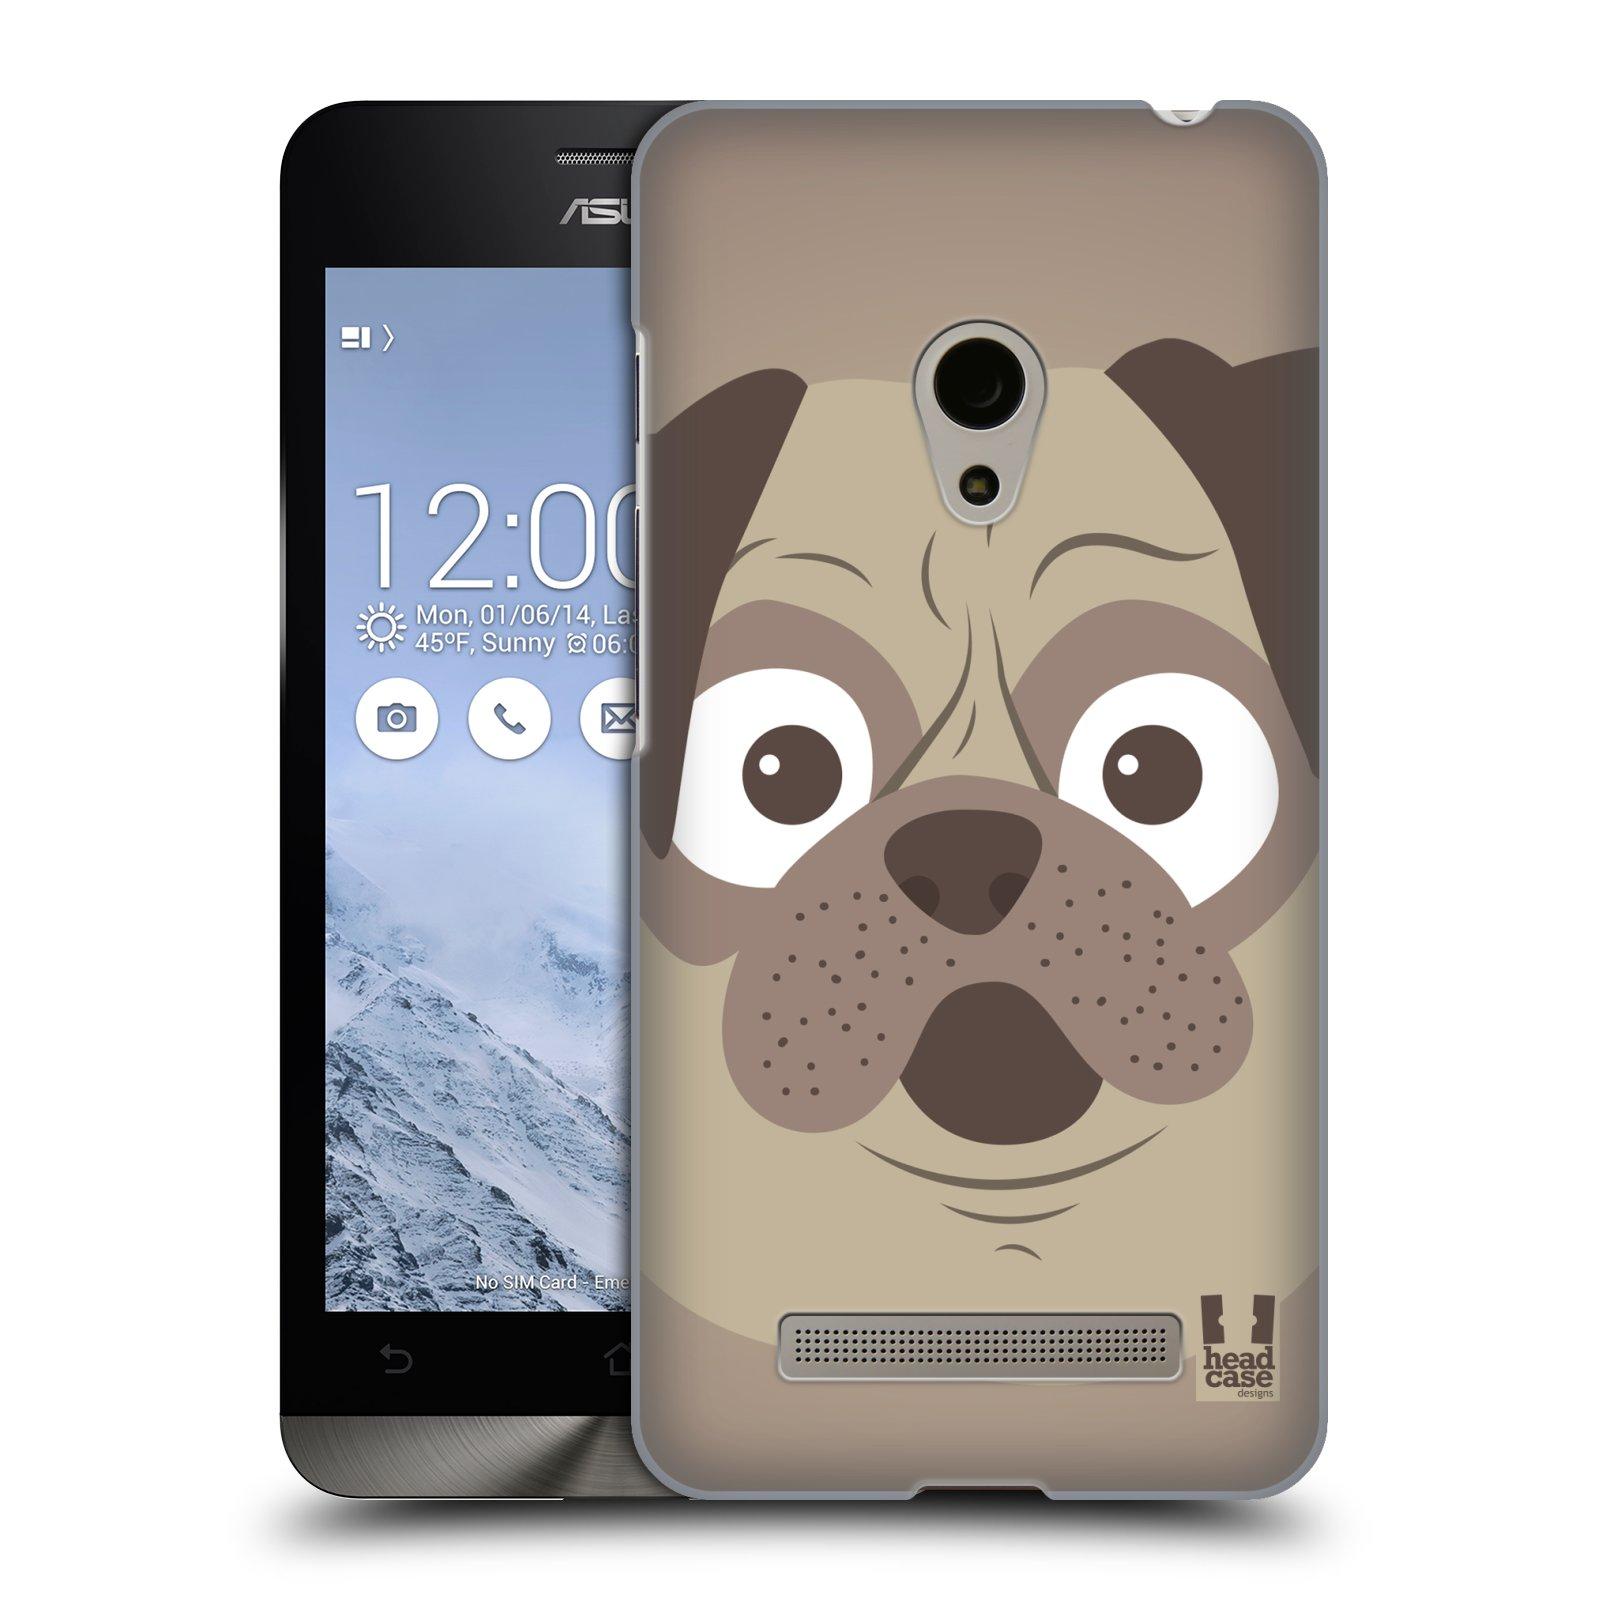 HEAD CASE plastový obal na mobil Asus Zenfone 5 vzor Cartoon Karikatura barevná kreslená zvířátka pes mopsík